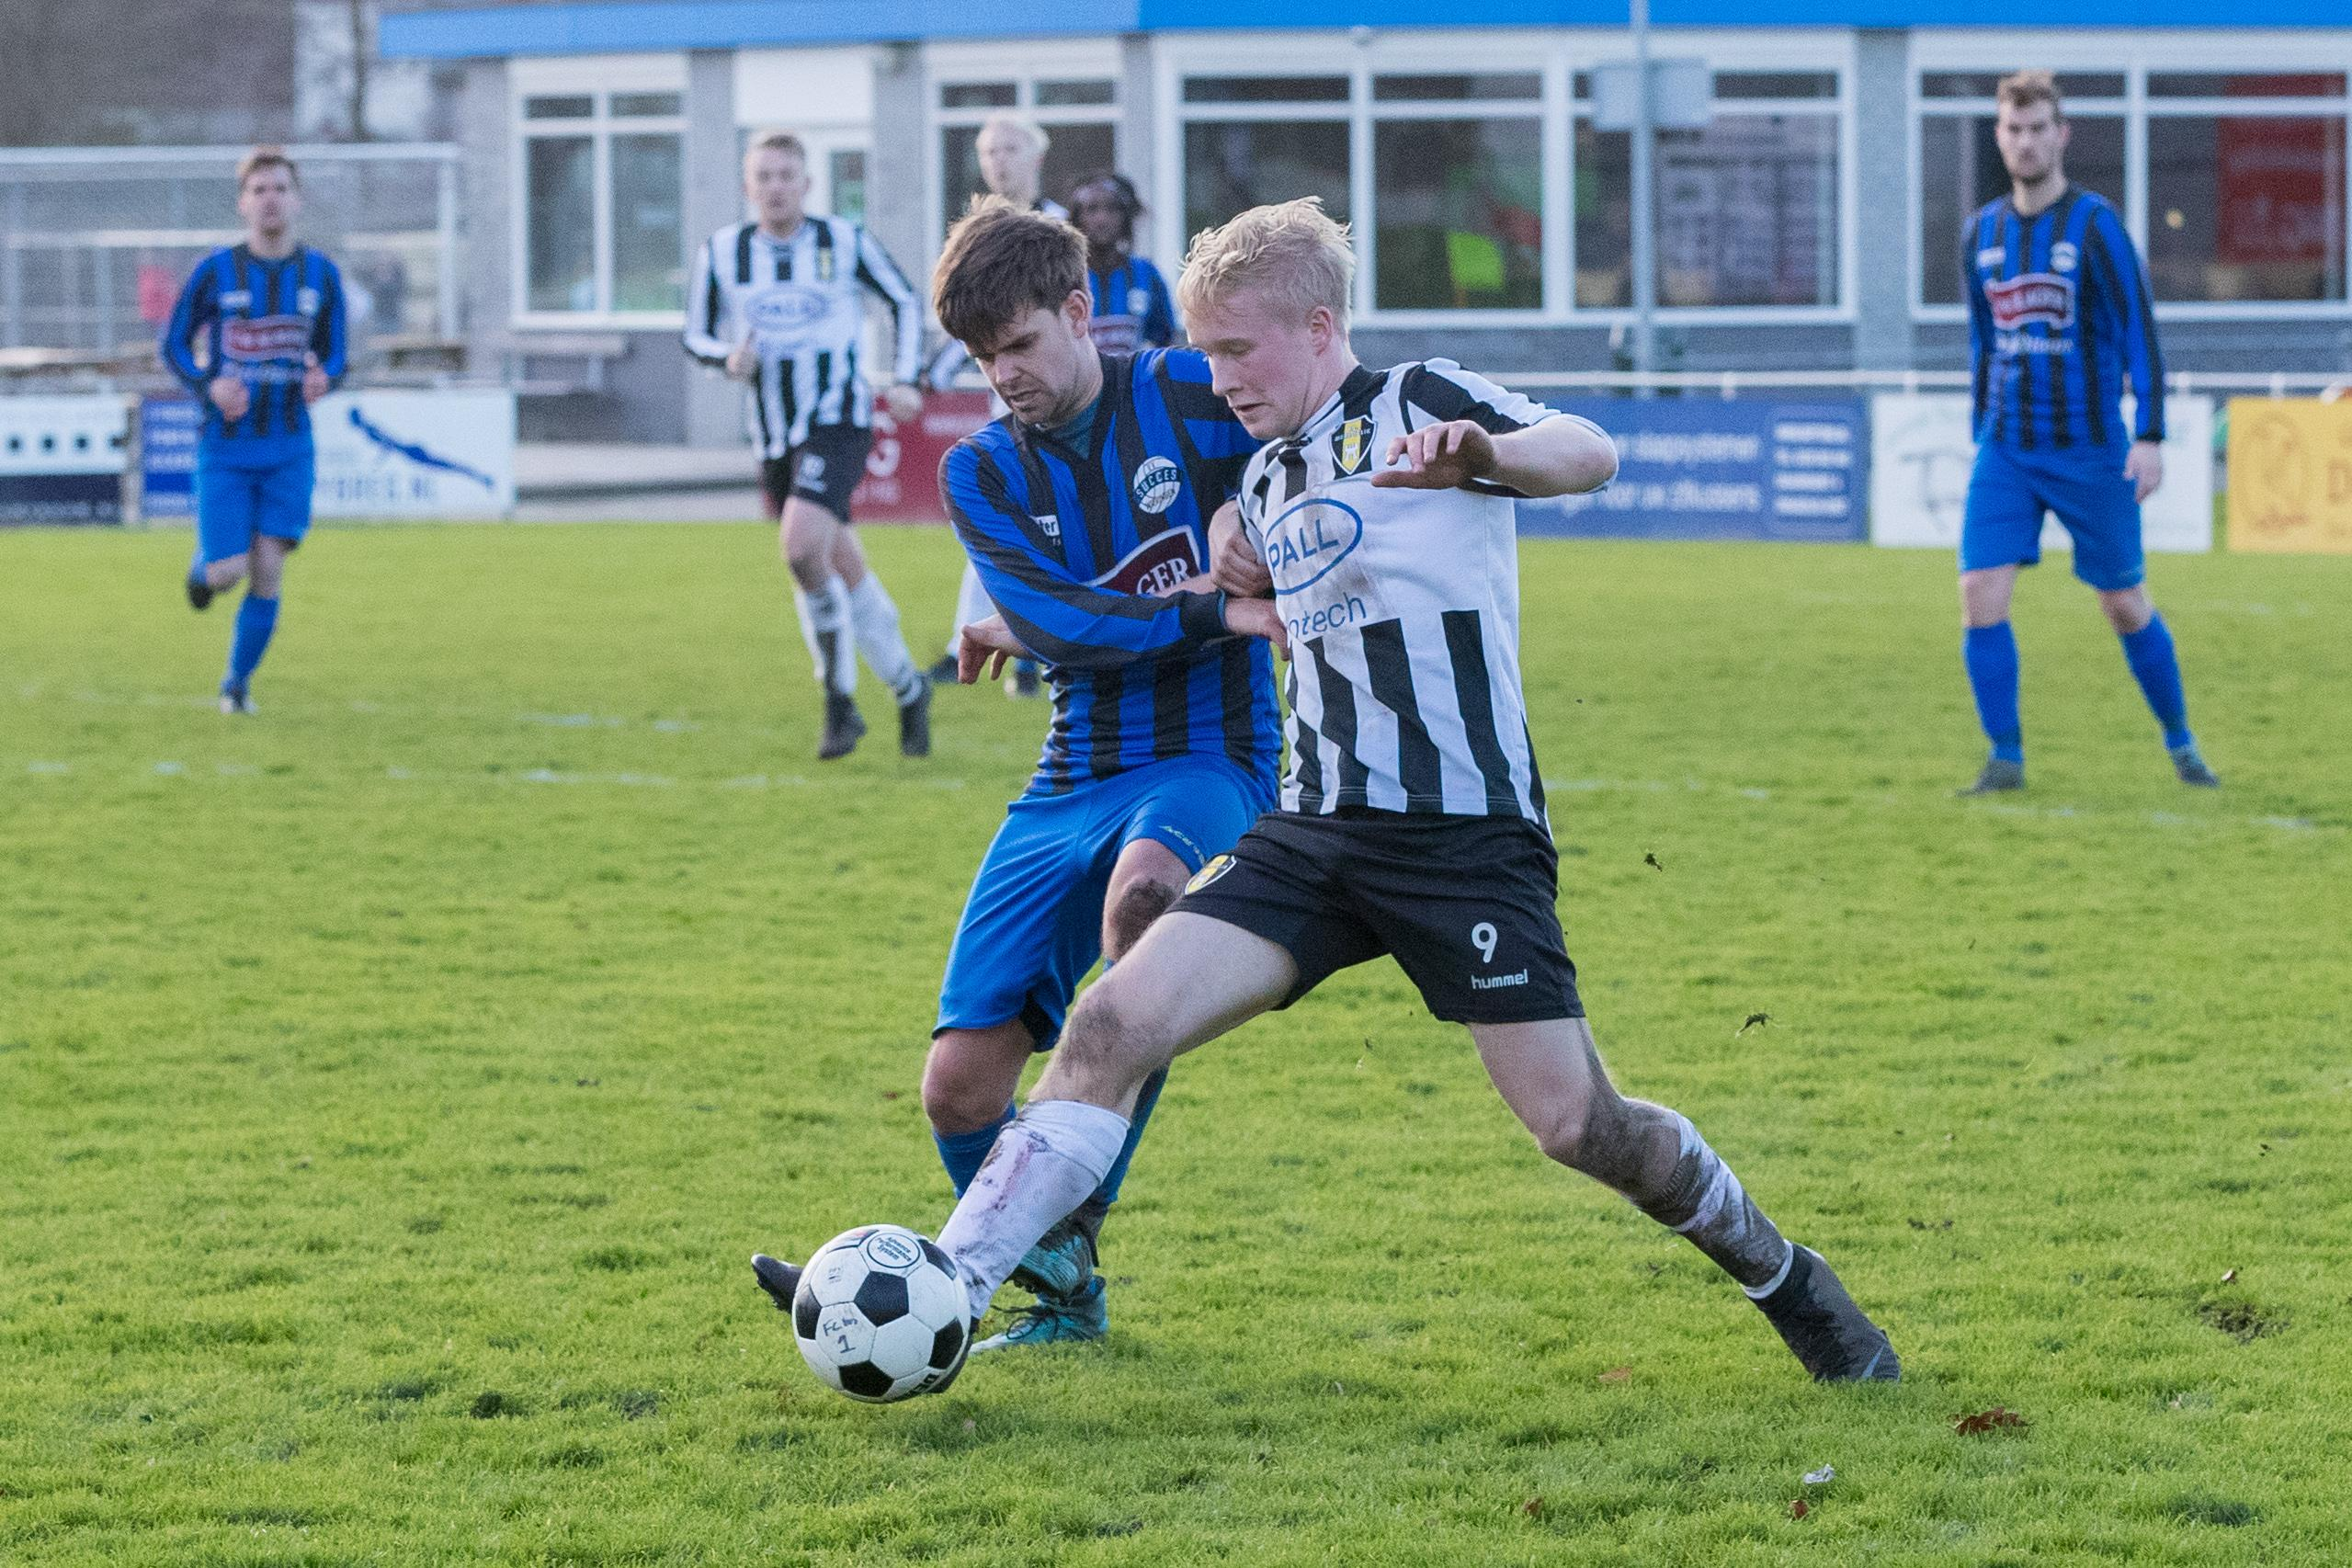 FC Medemblik ook volgend seizoen onder leiding van trainer Stephan Kaaij